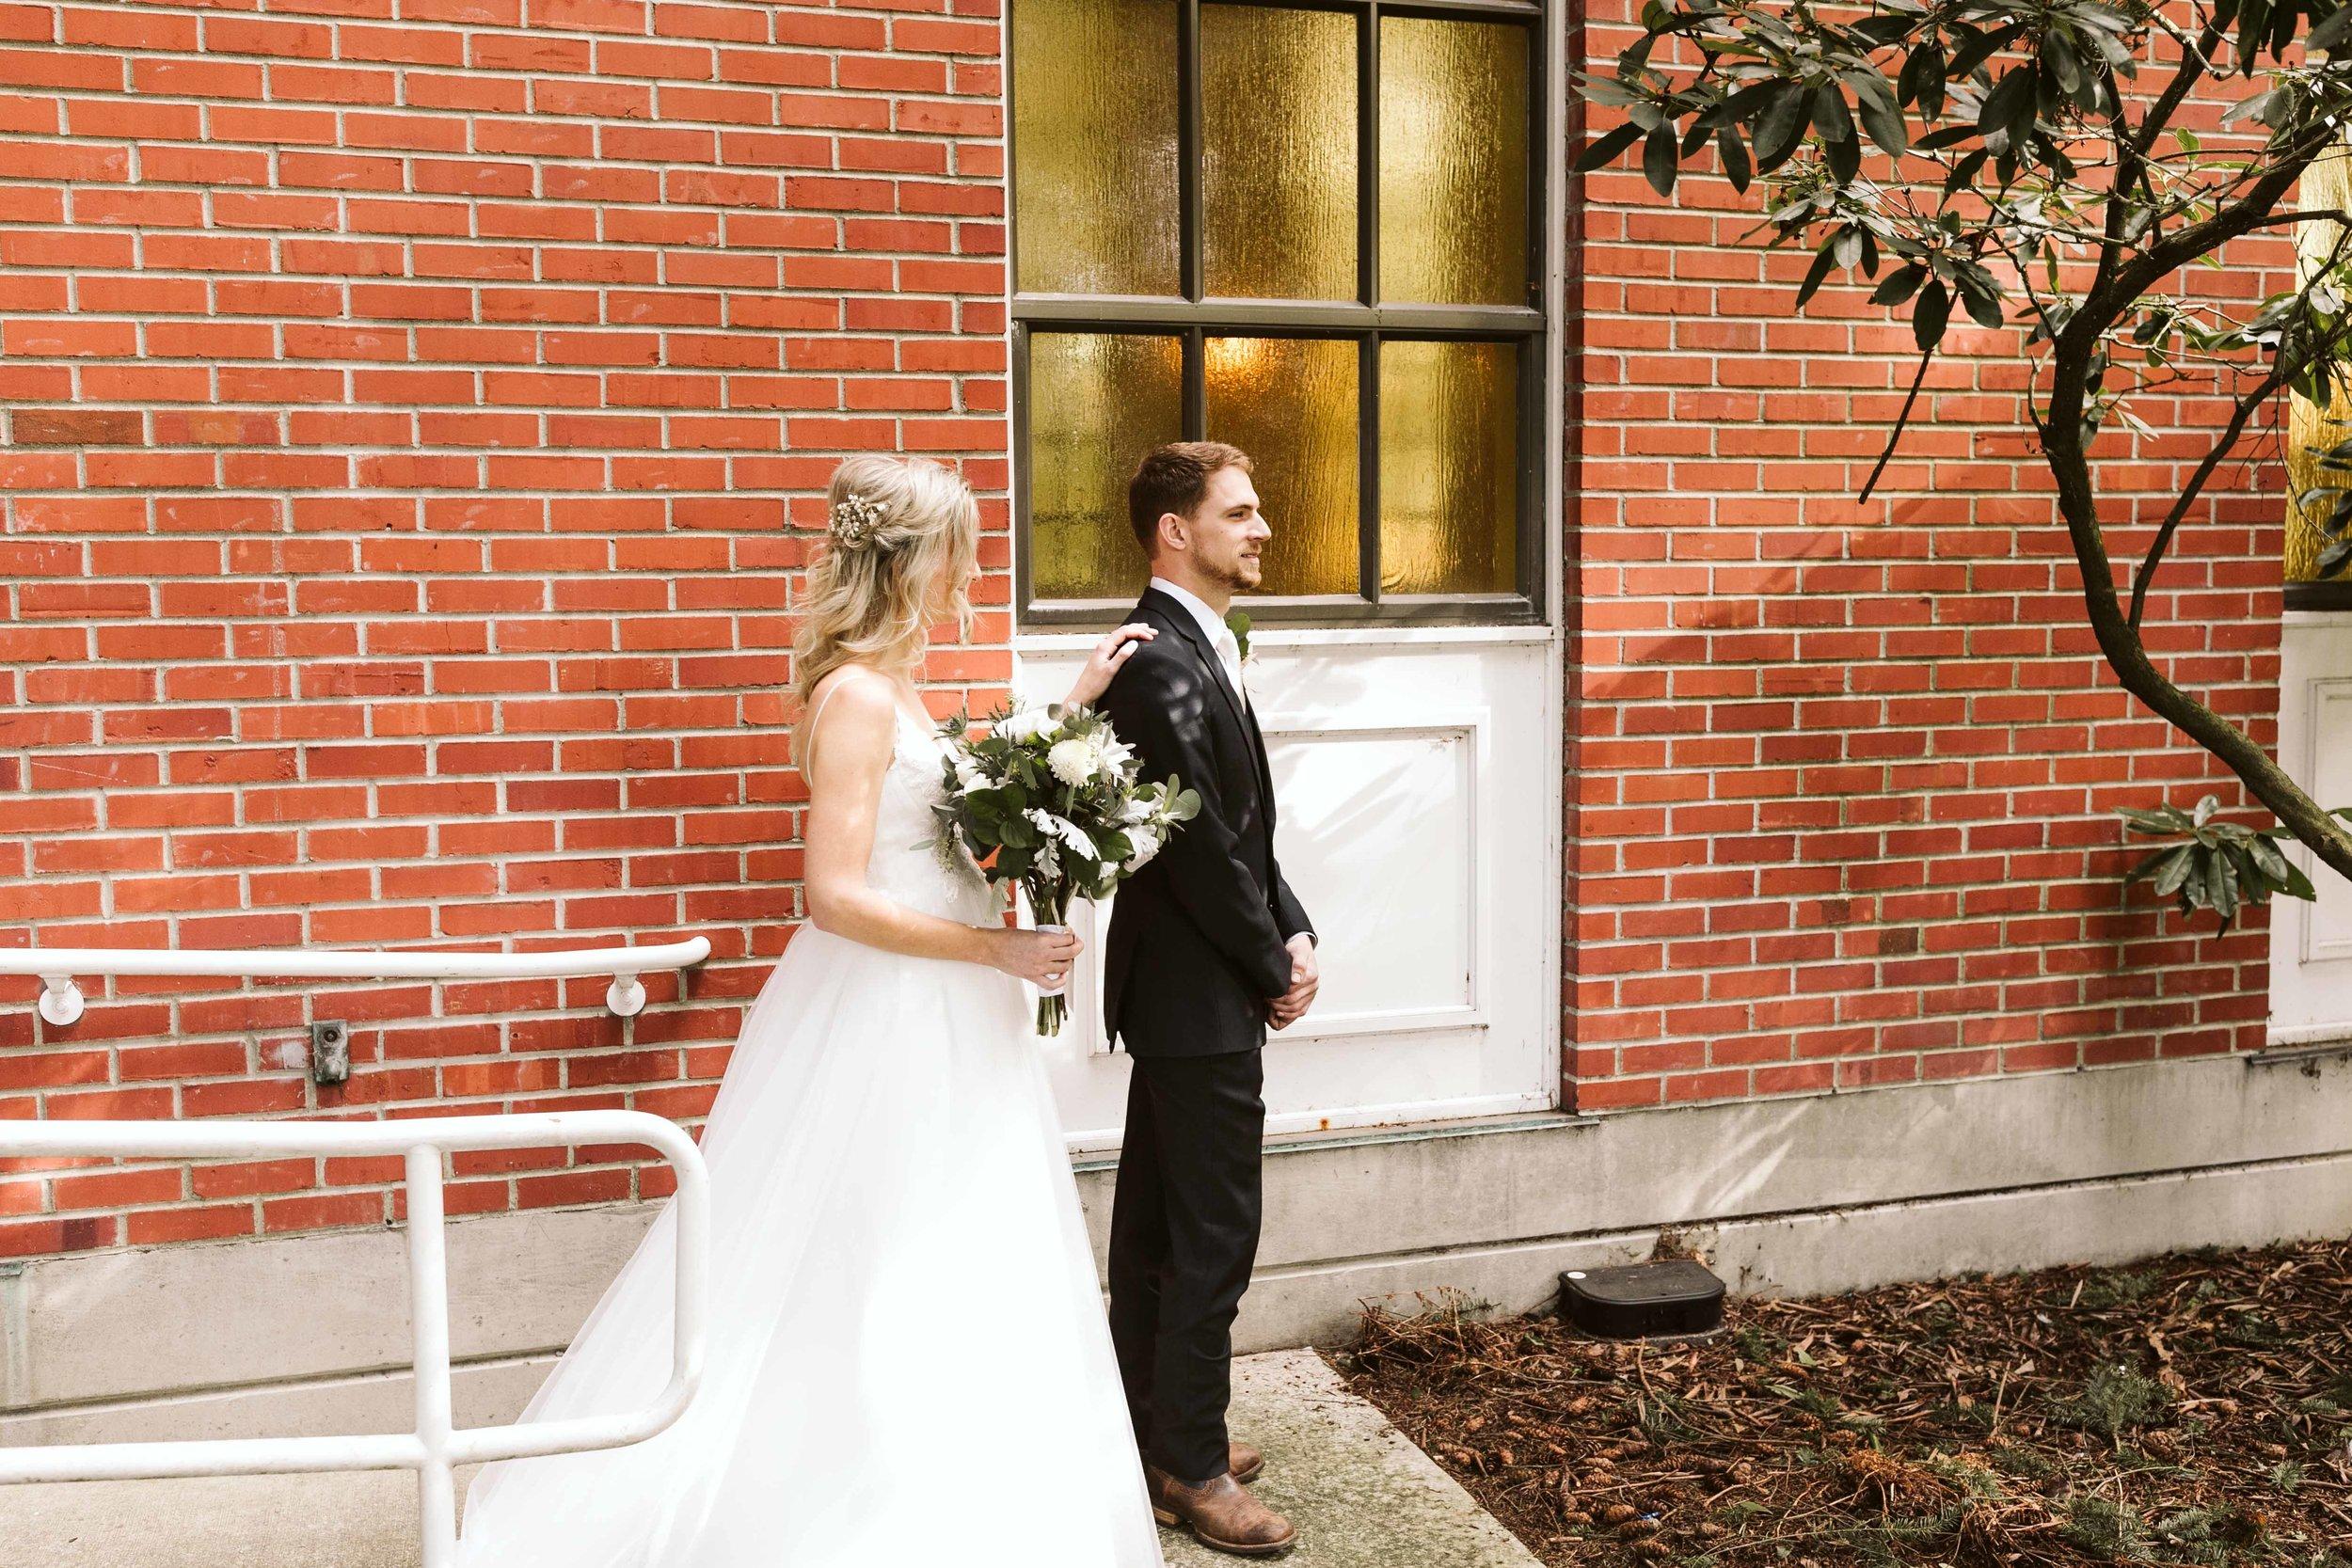 kilworth-memorial-chapel-wedding-19.jpg